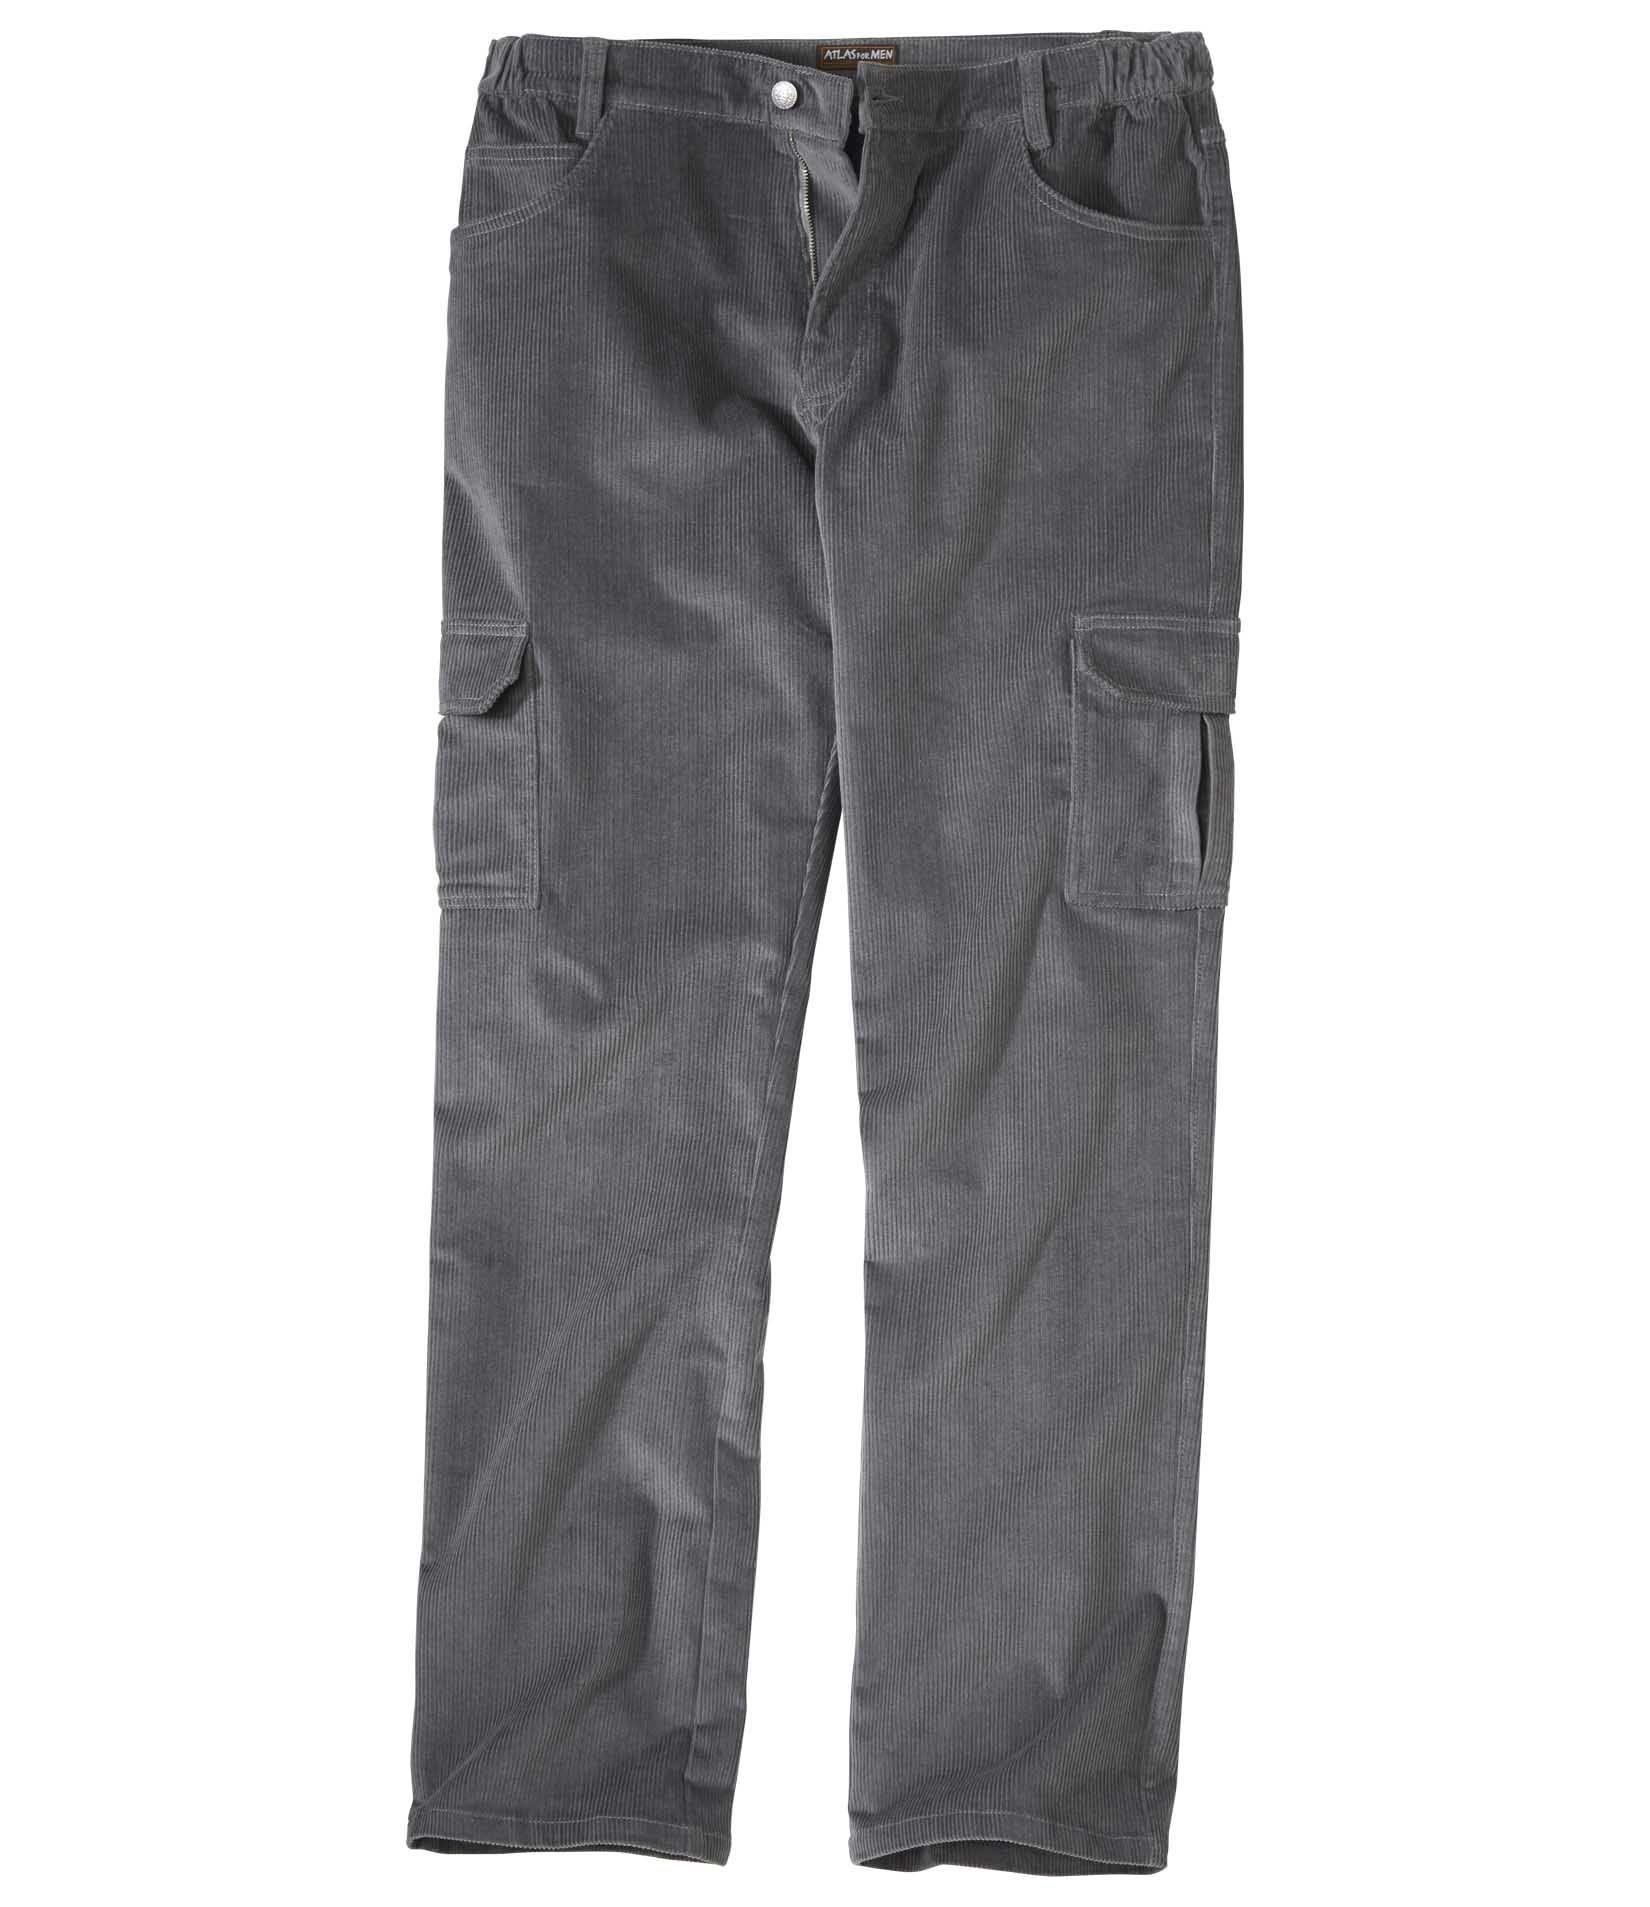 Pantalon Velours Battle Confort Stretch  #discount#promo#atlasformen#formen#shopping#